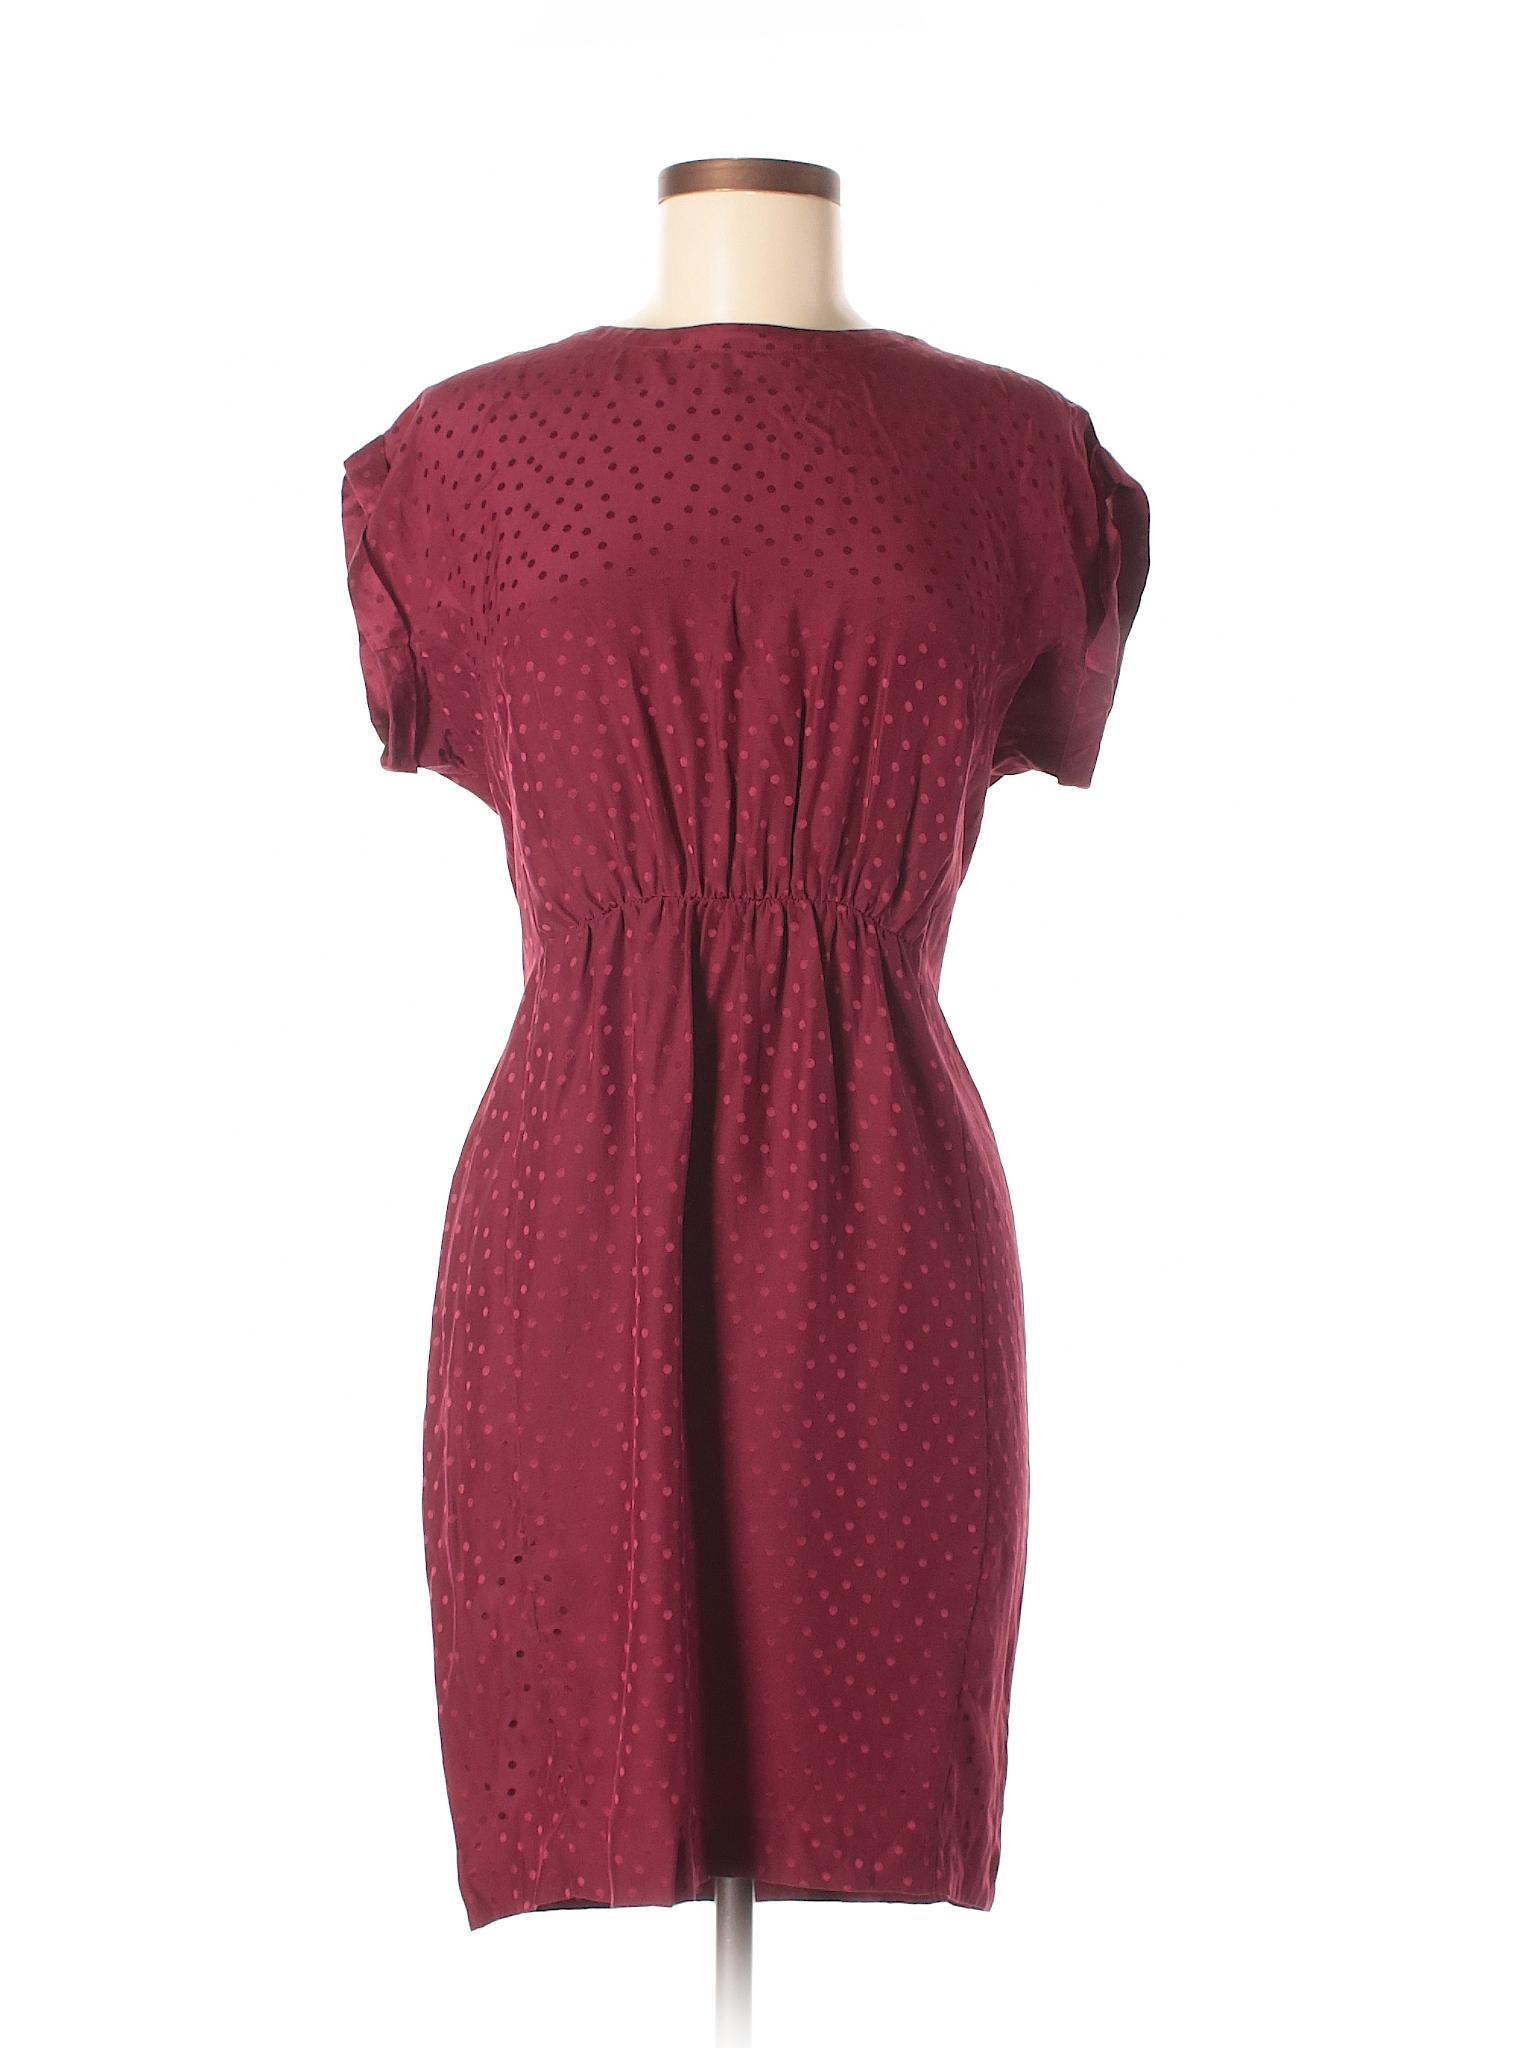 Boutique Casual winter Dress Fossil Boutique winter qgwzOvxz